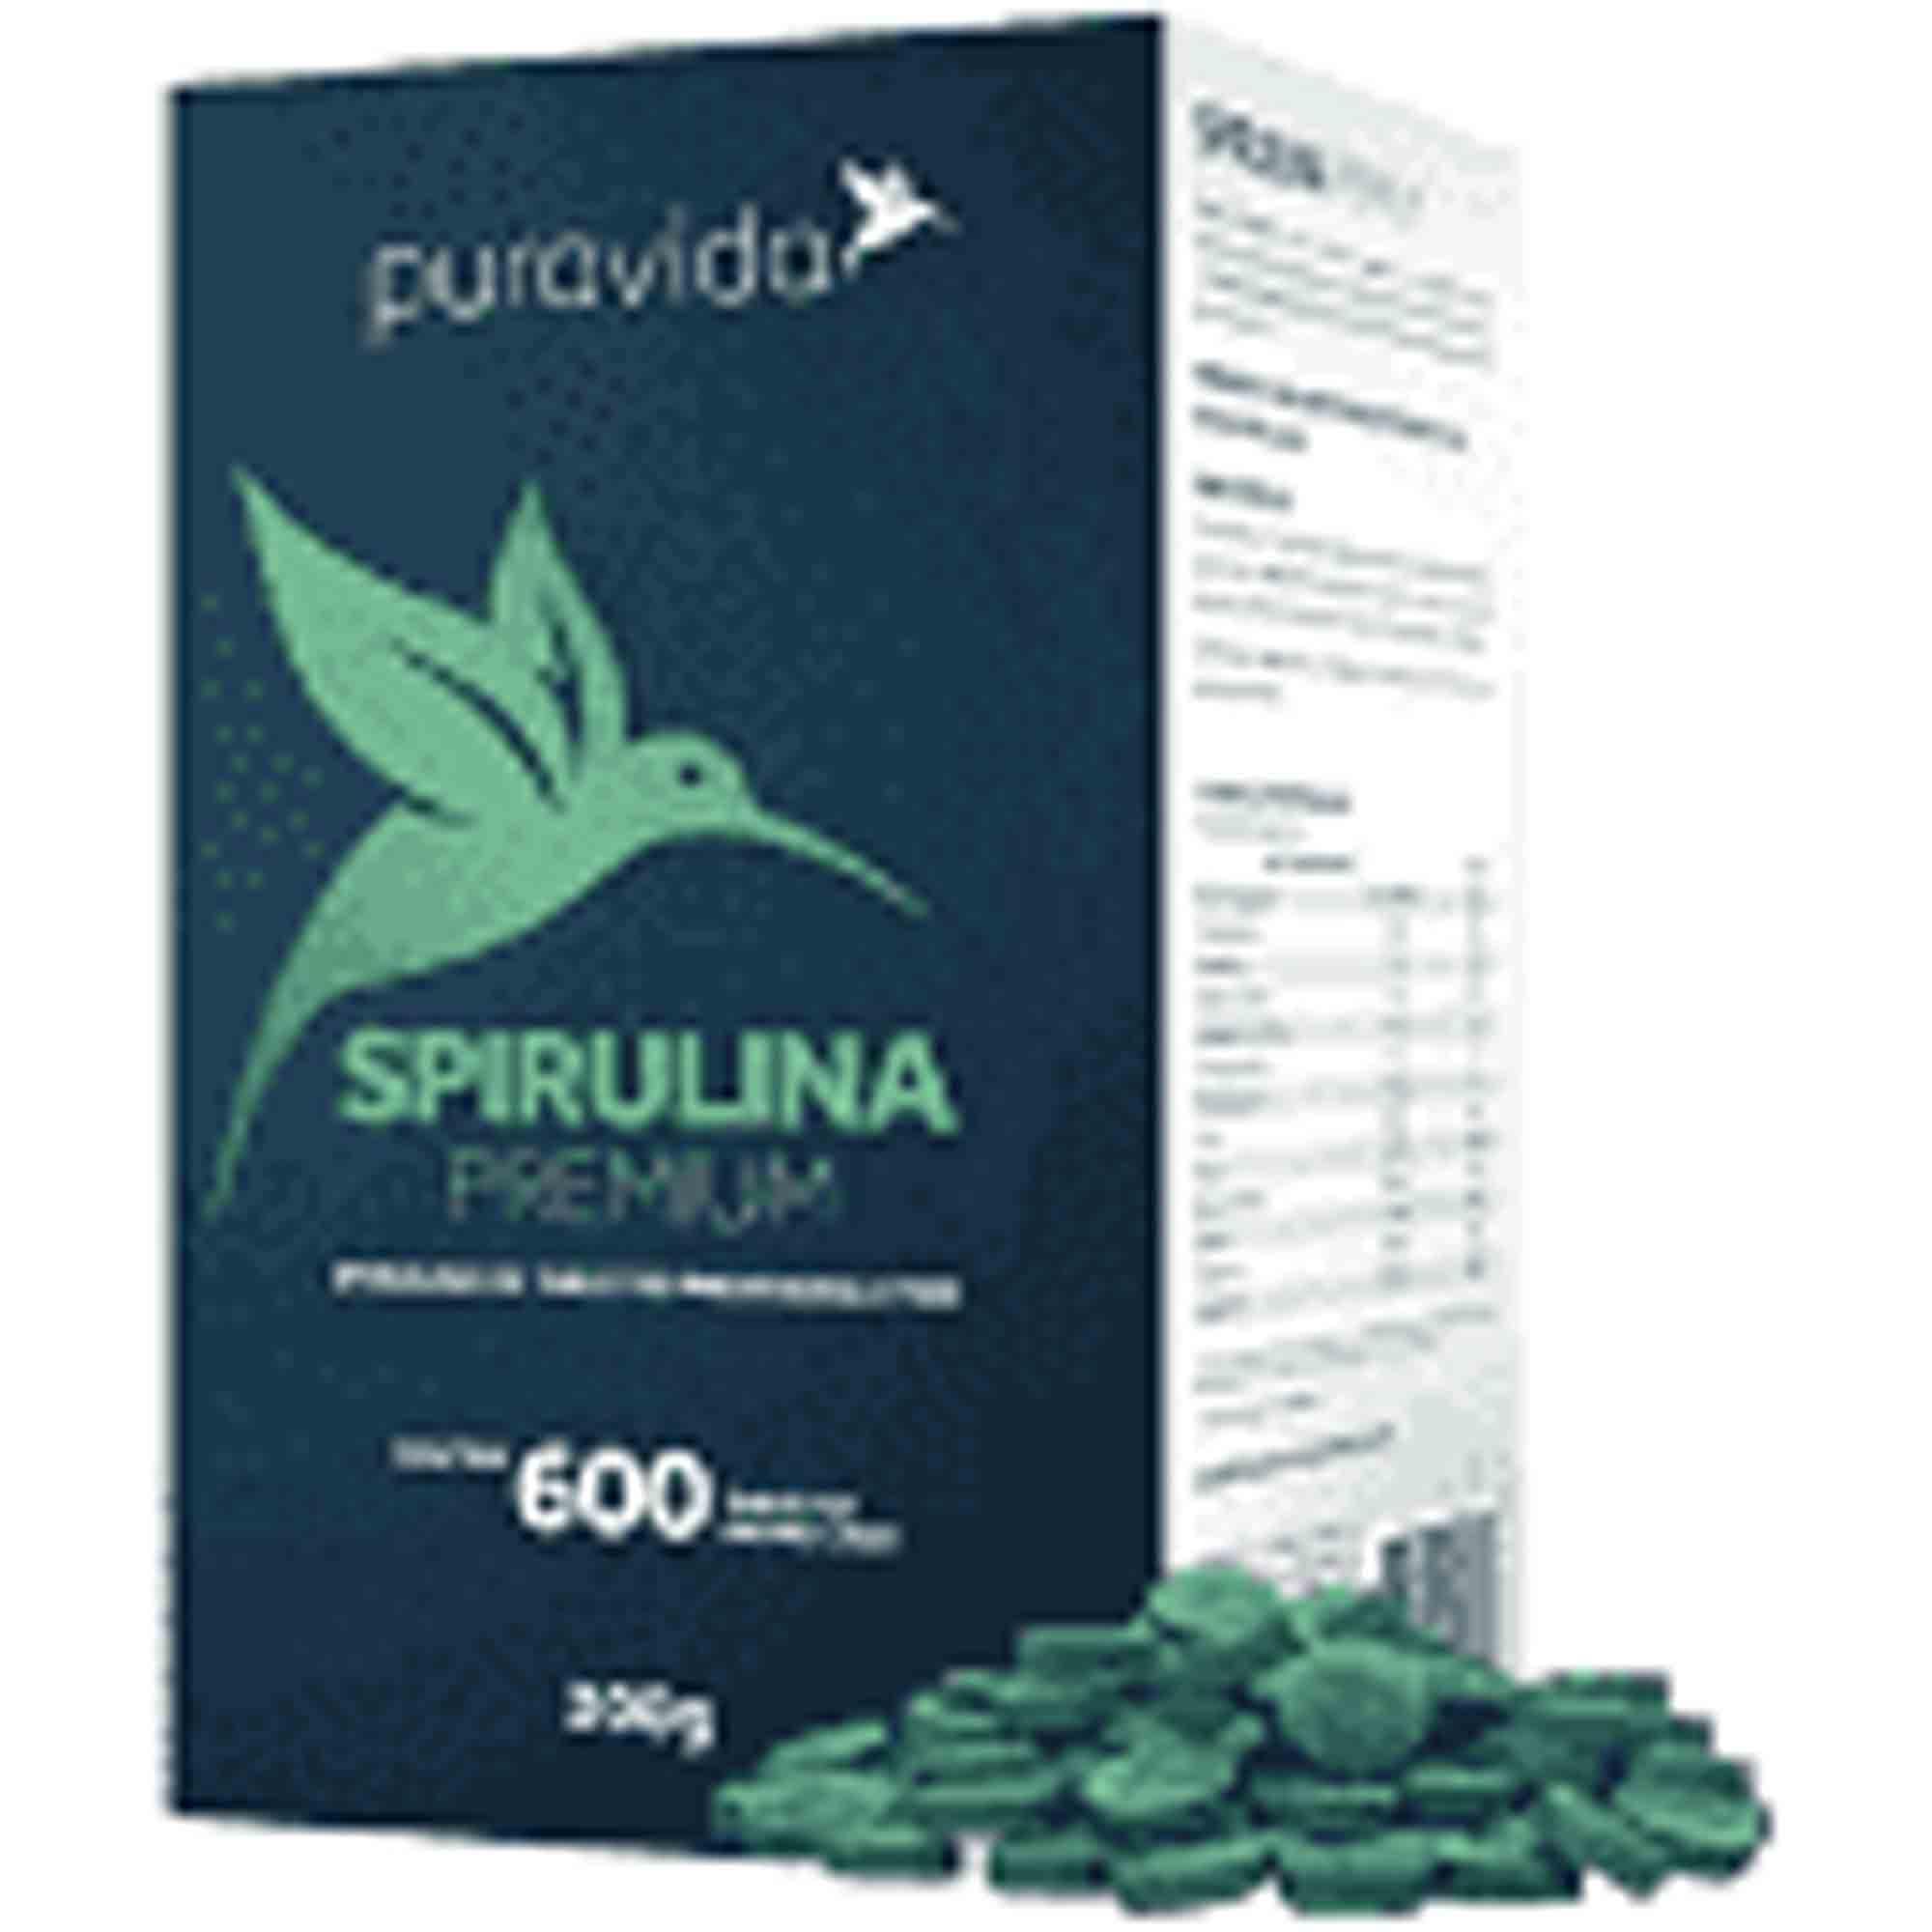 Spirulina Orgânica Premium 600 Tabl 300g Pura Vida